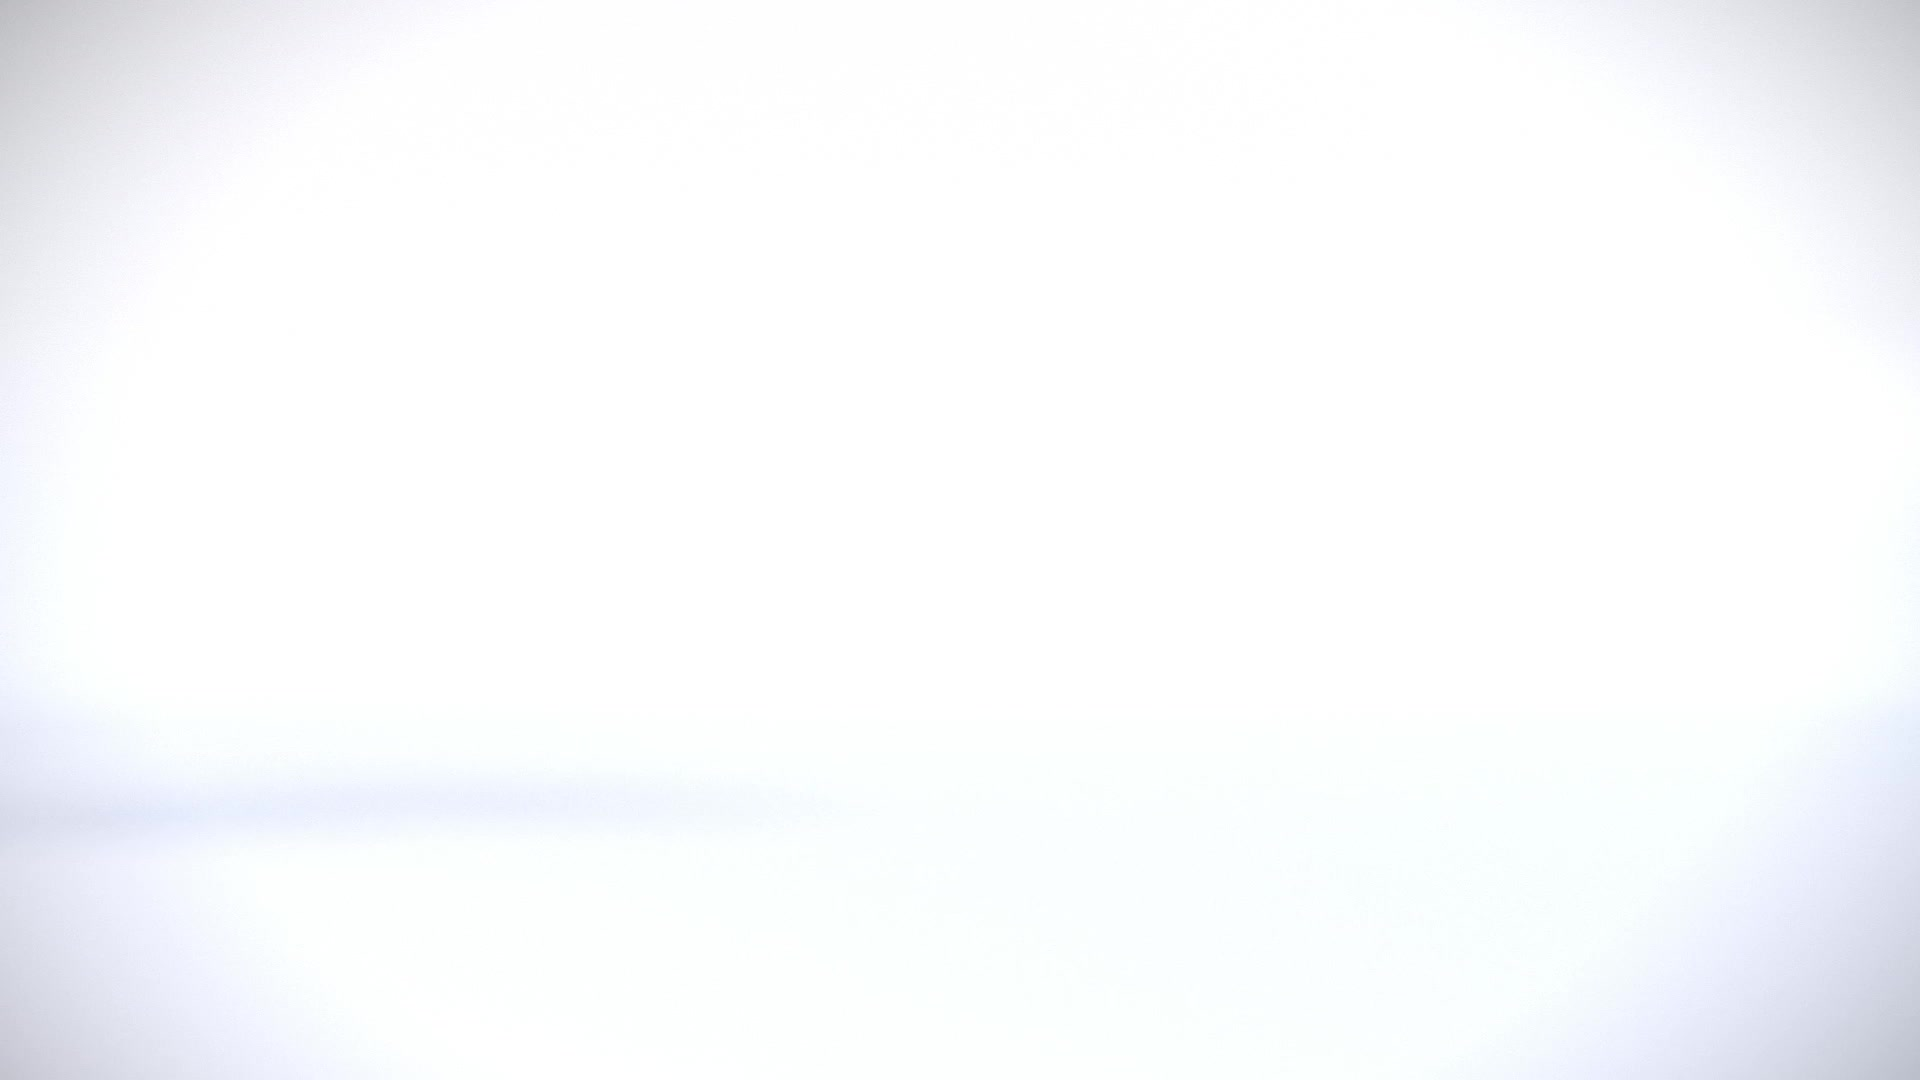 Rwby Season 2 Gifs Search | Search & Share on Homdor